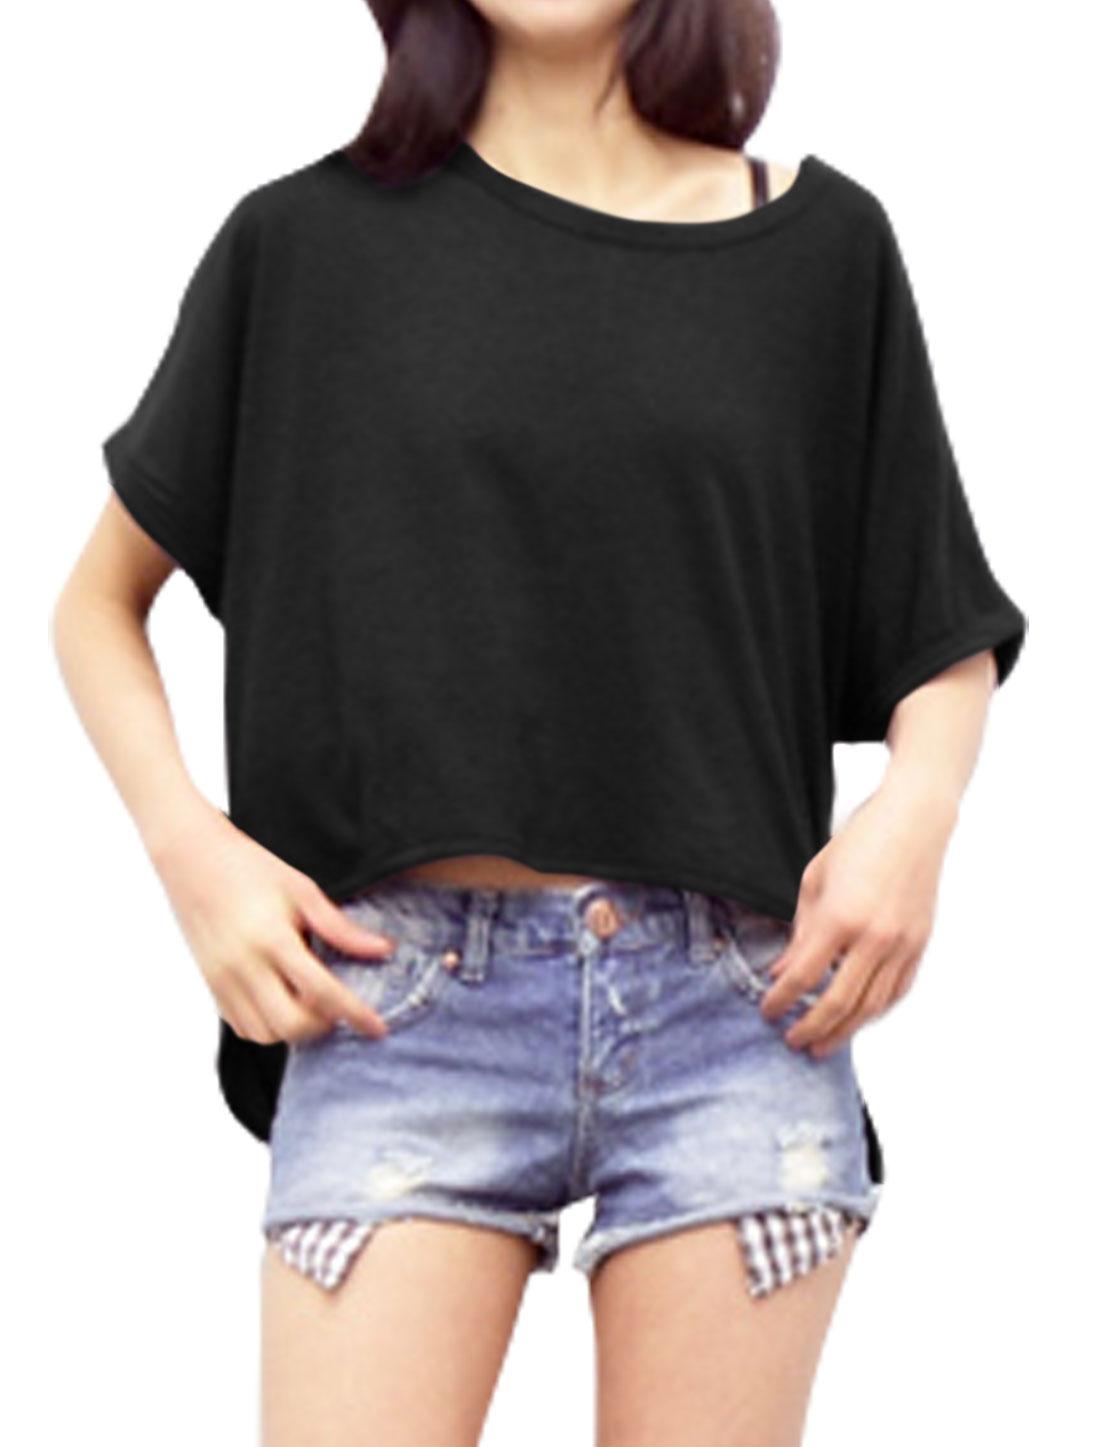 Women Round Neck Batwing Sleeves High Low Hem Loose Top Black XS